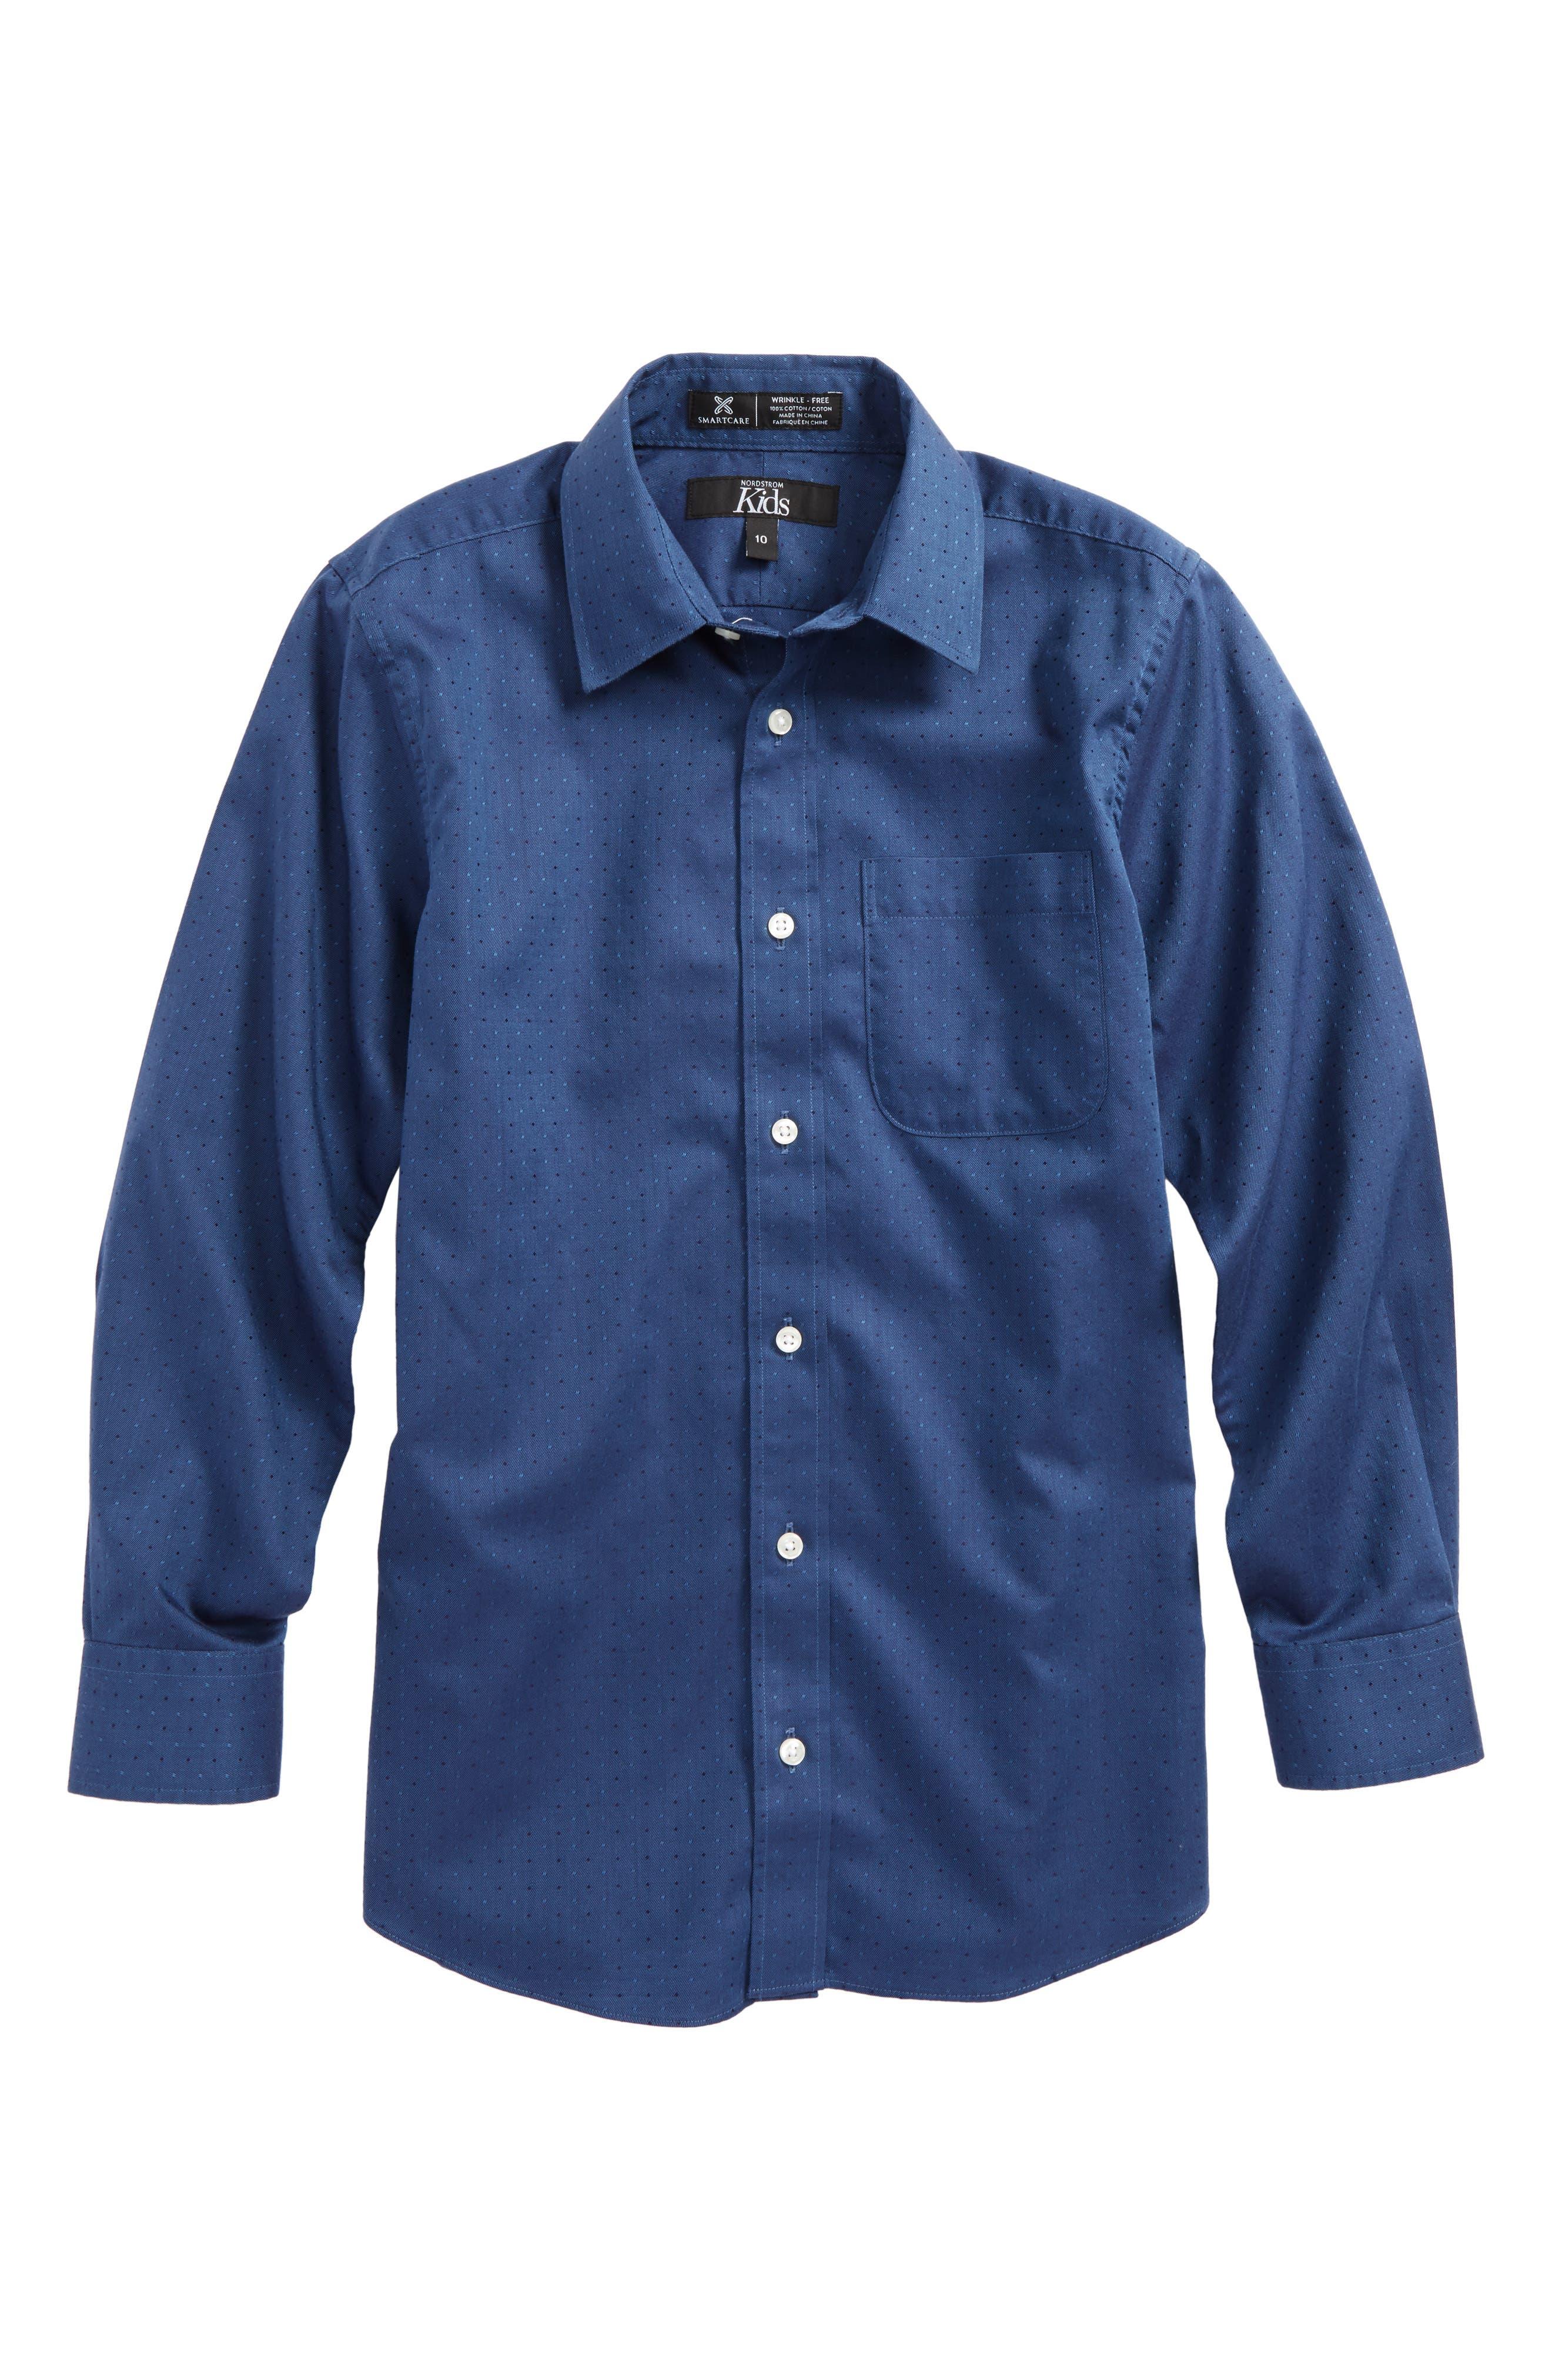 Dot Jacquard Sport Shirt,                         Main,                         color, Navy Denim Neat Dot